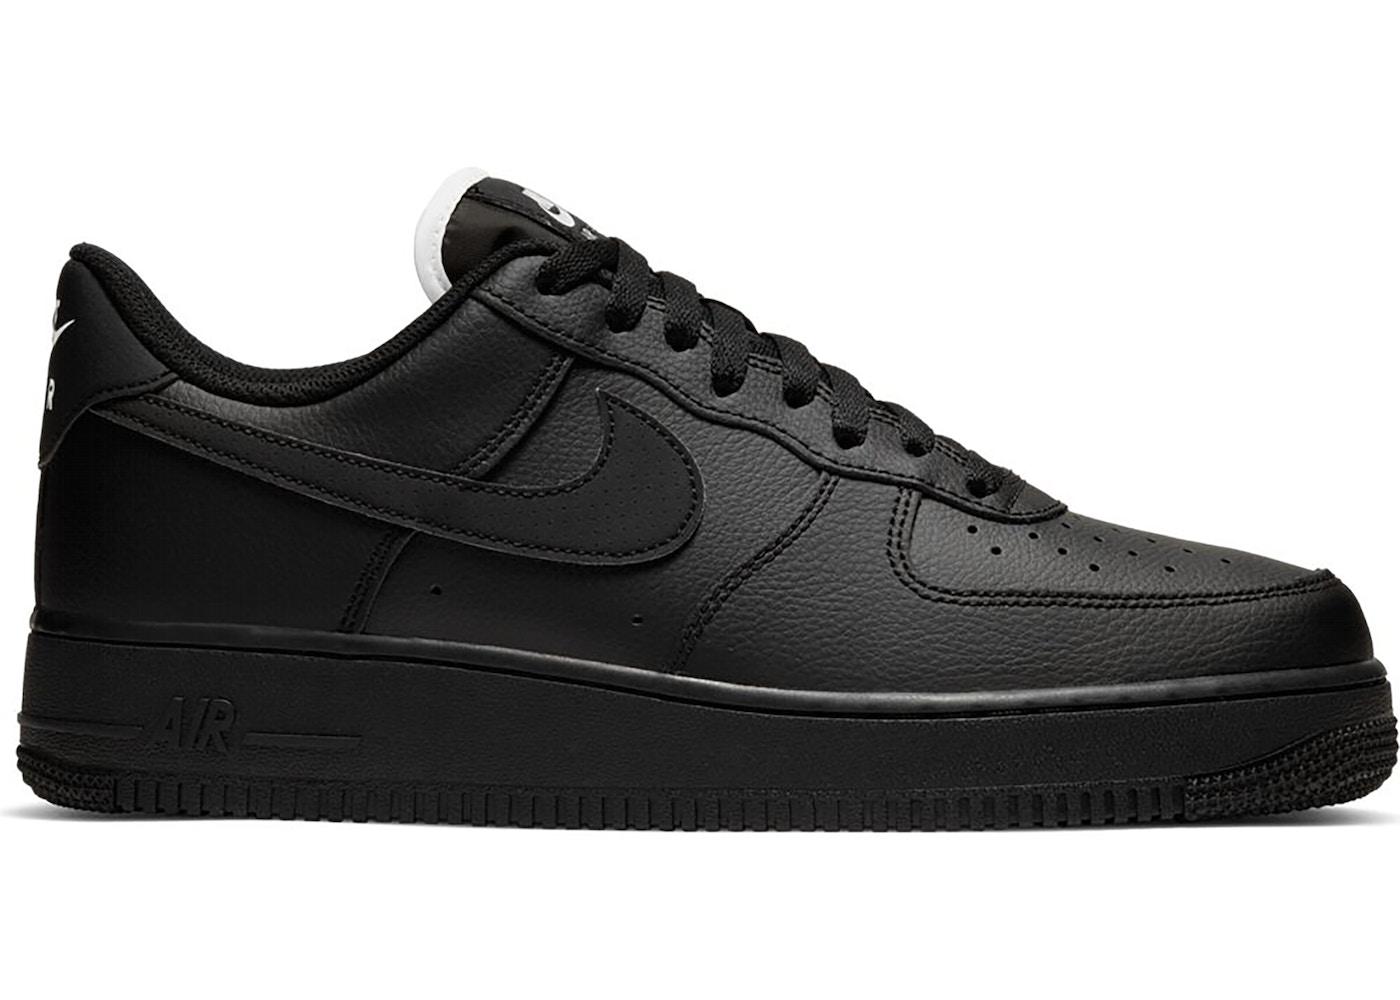 Nike Air Force 1 Low Triple Black (White Tongue)